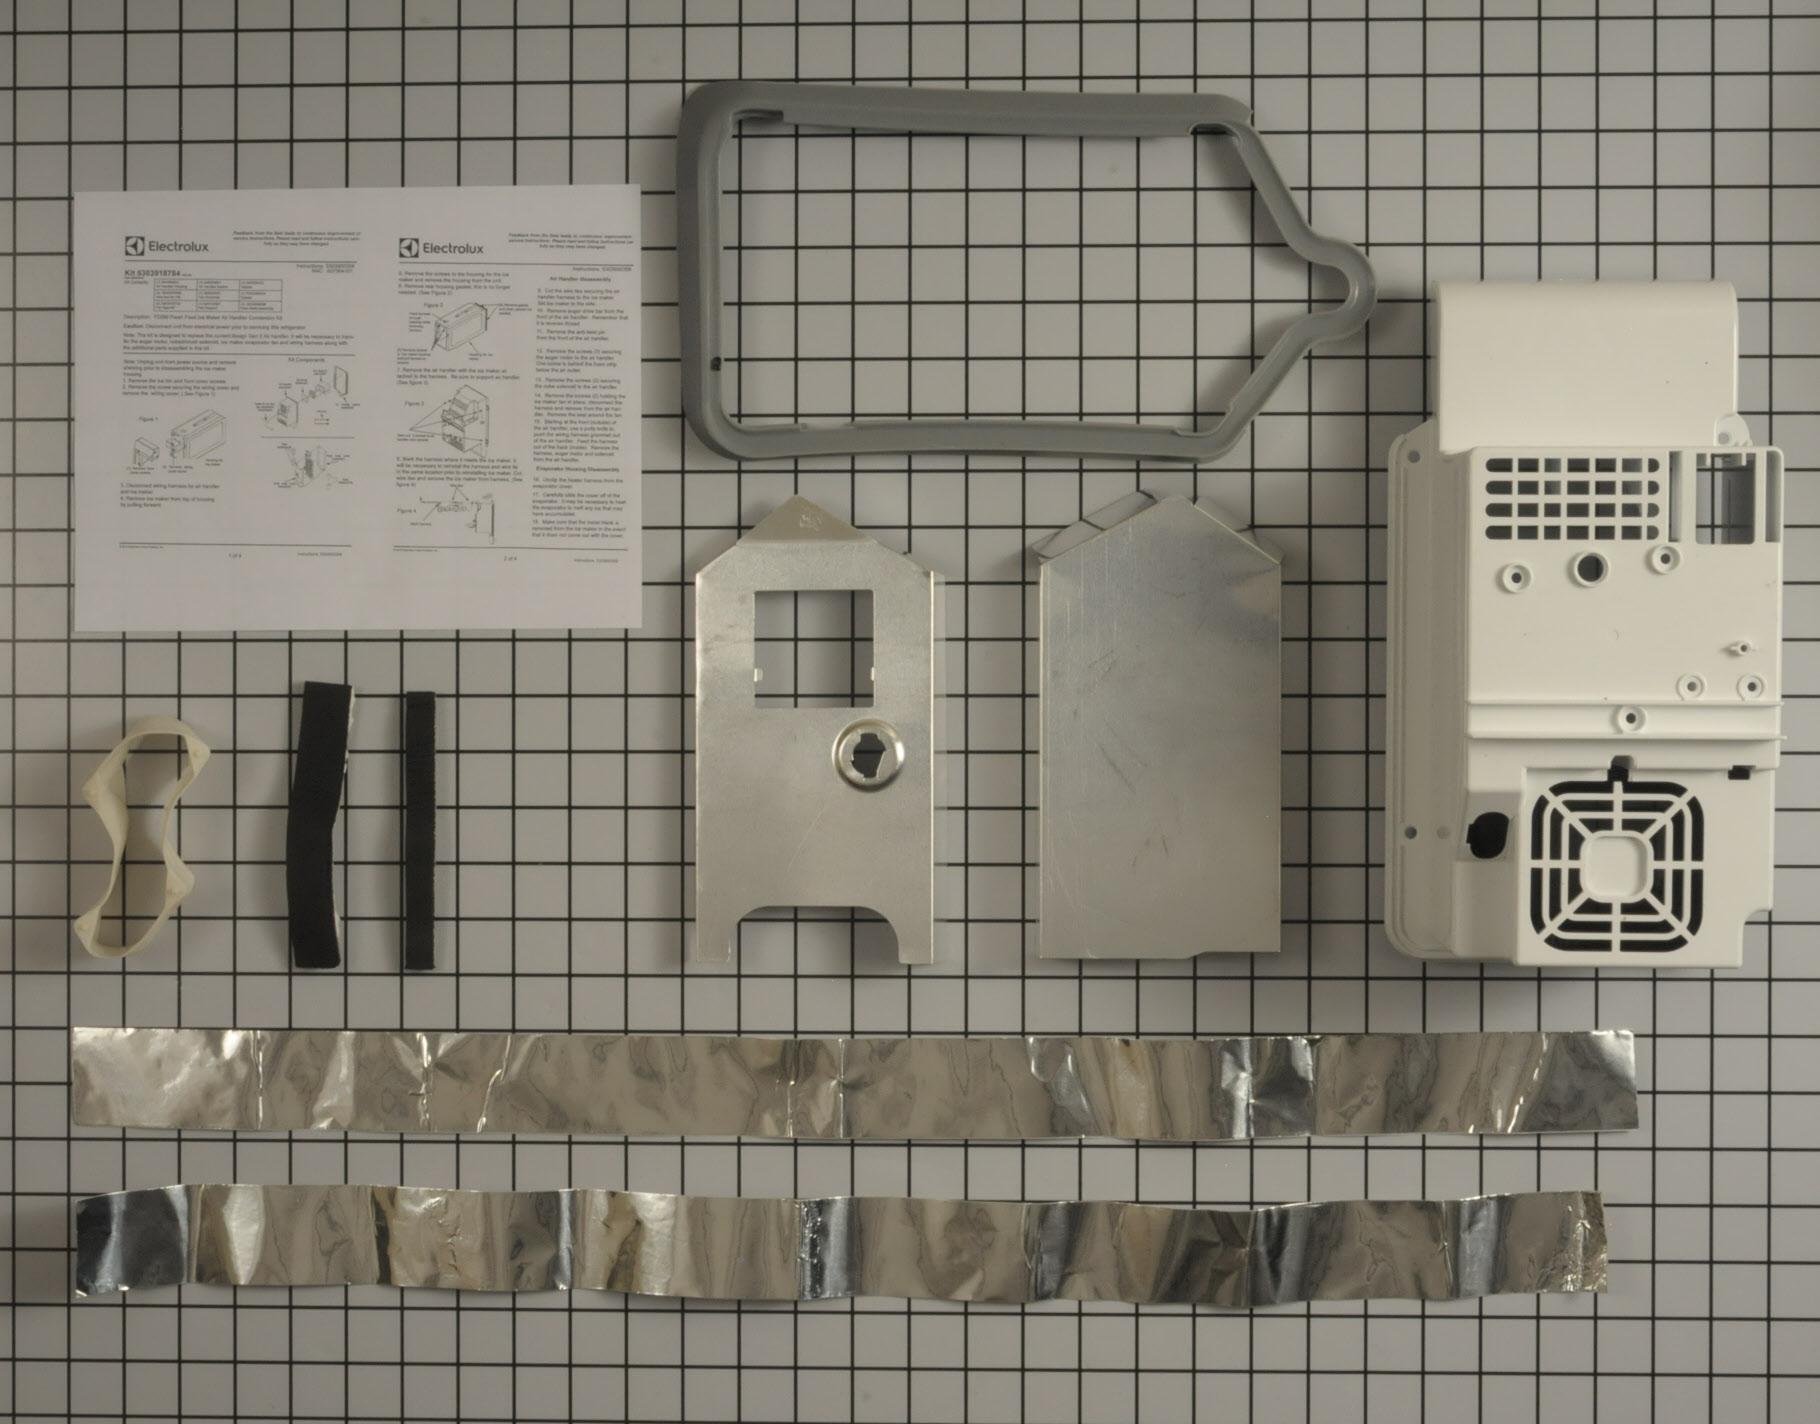 Kenmore Refrigerator Part # 5303918784 - Fan Motor